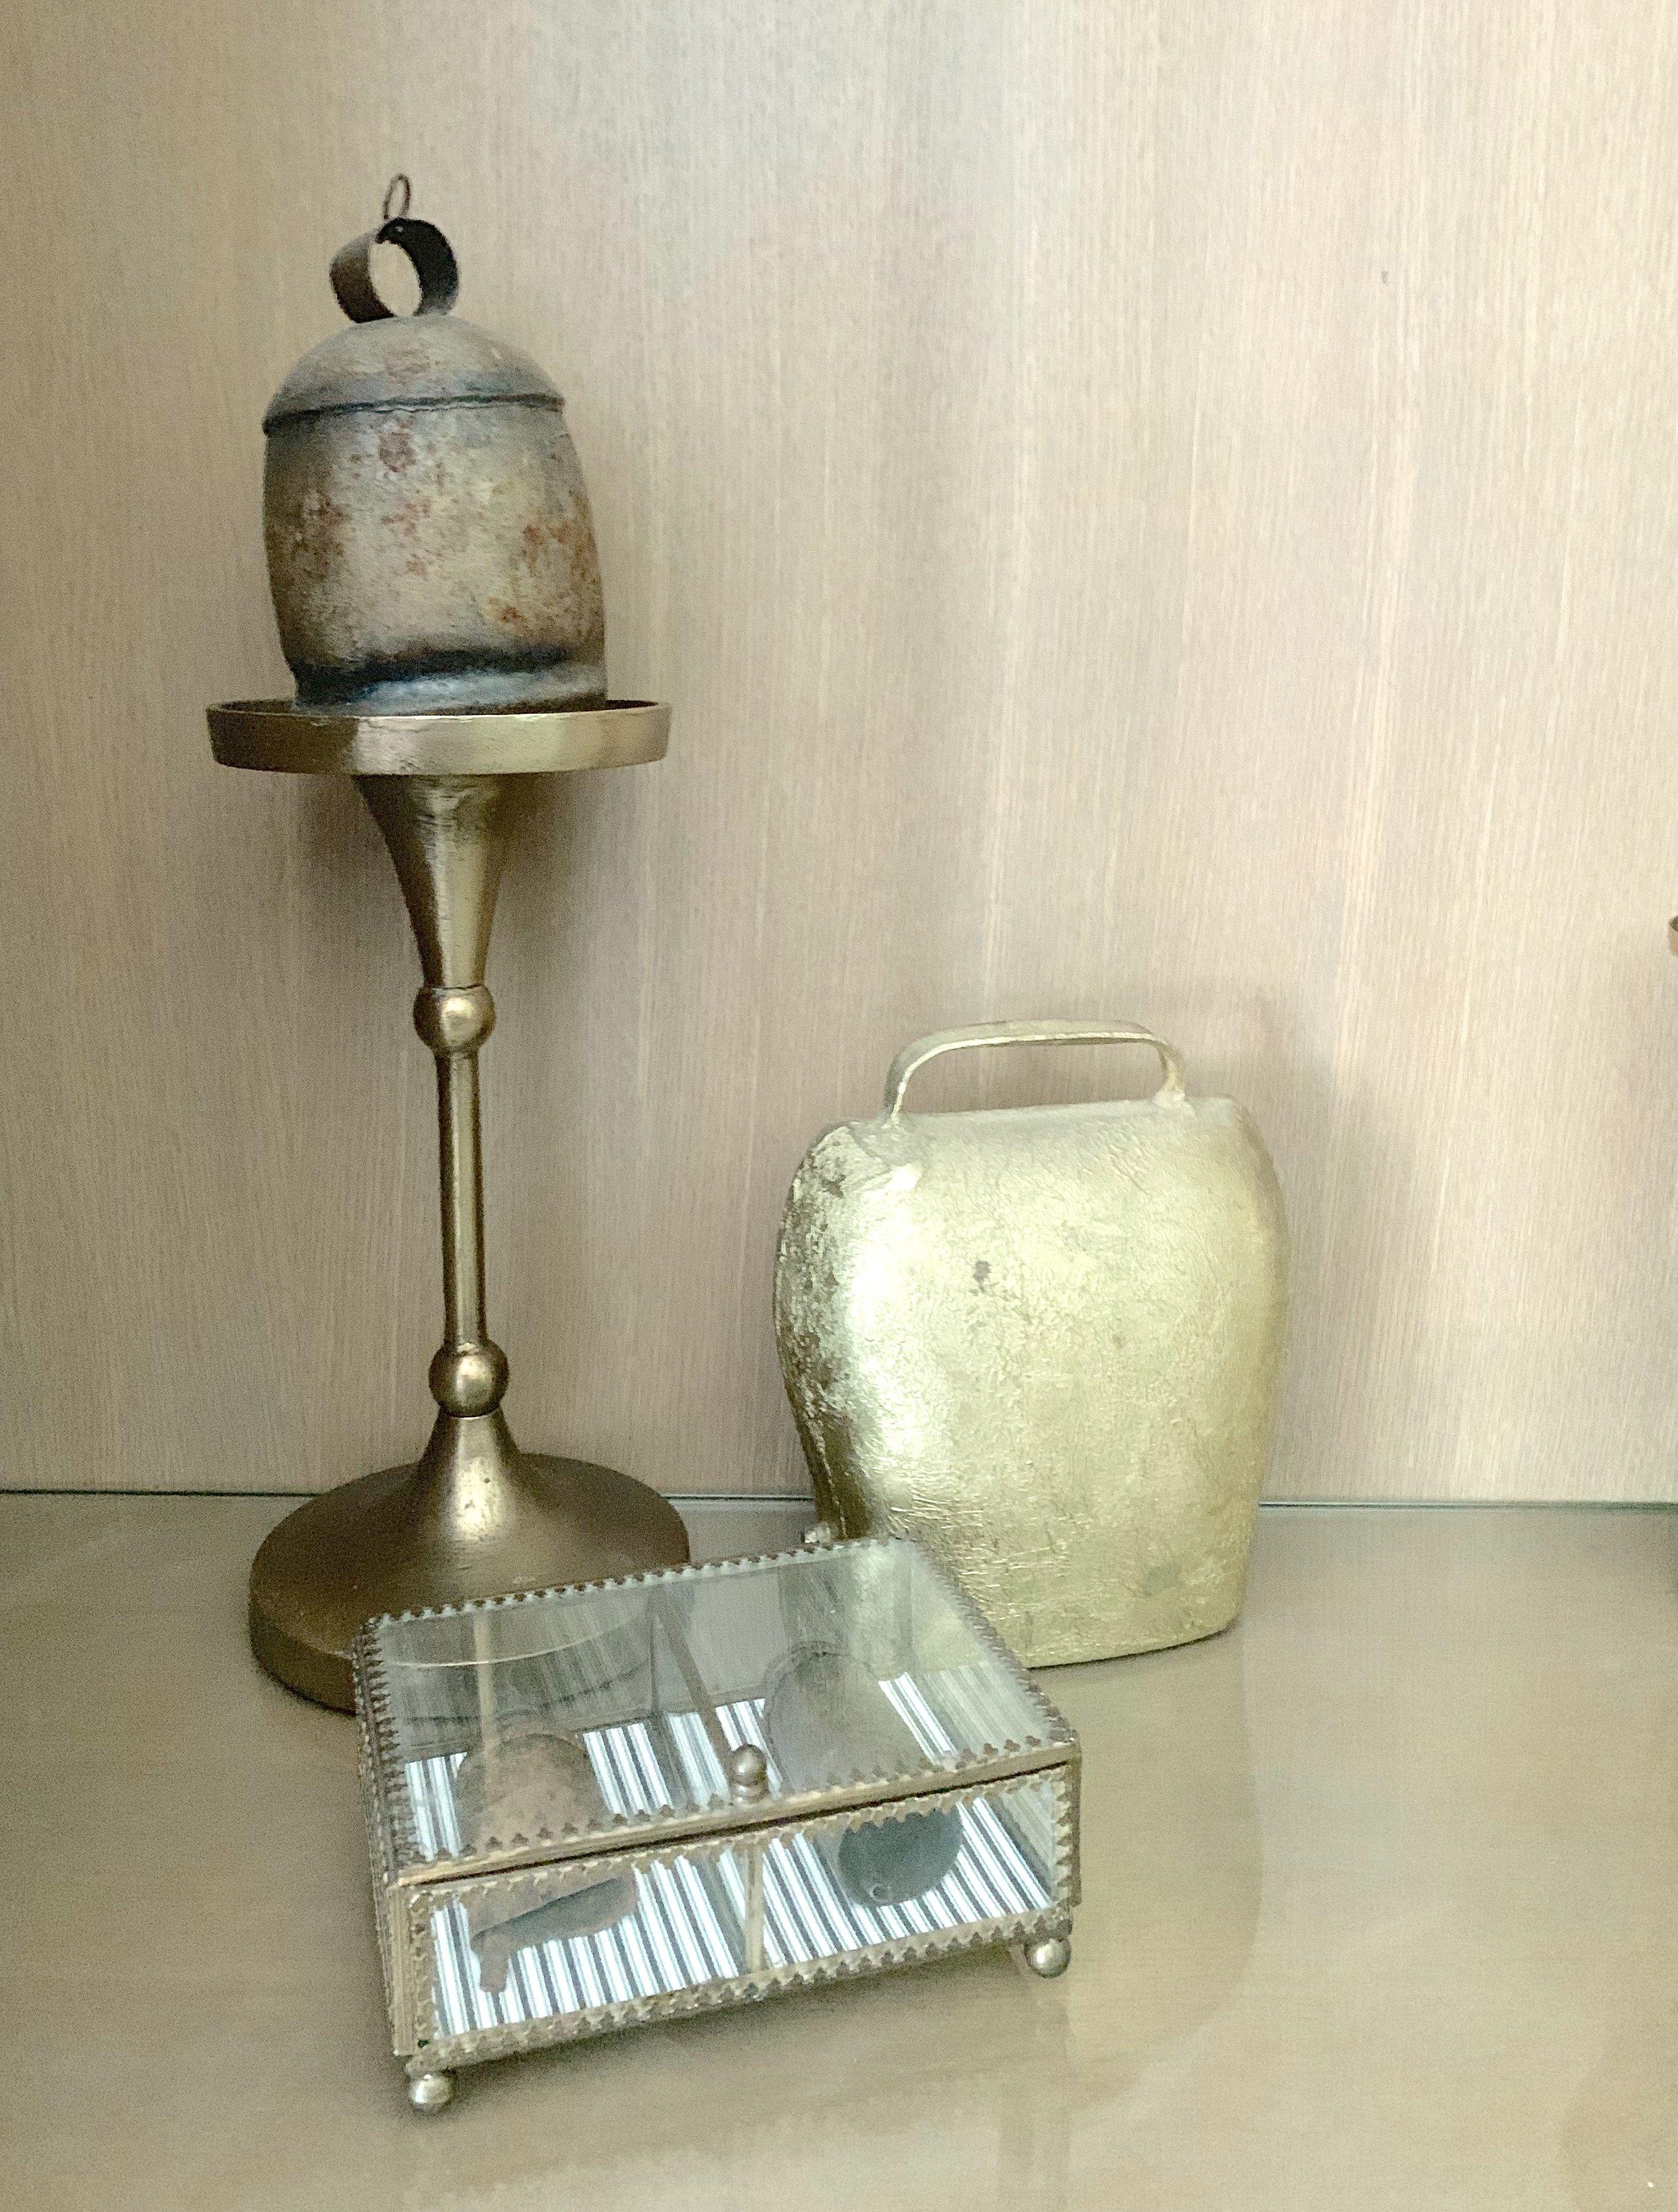 Ballard Designs Jacques Candle Holder modern farmhouse shelf décor. Farmhouse Redefined.